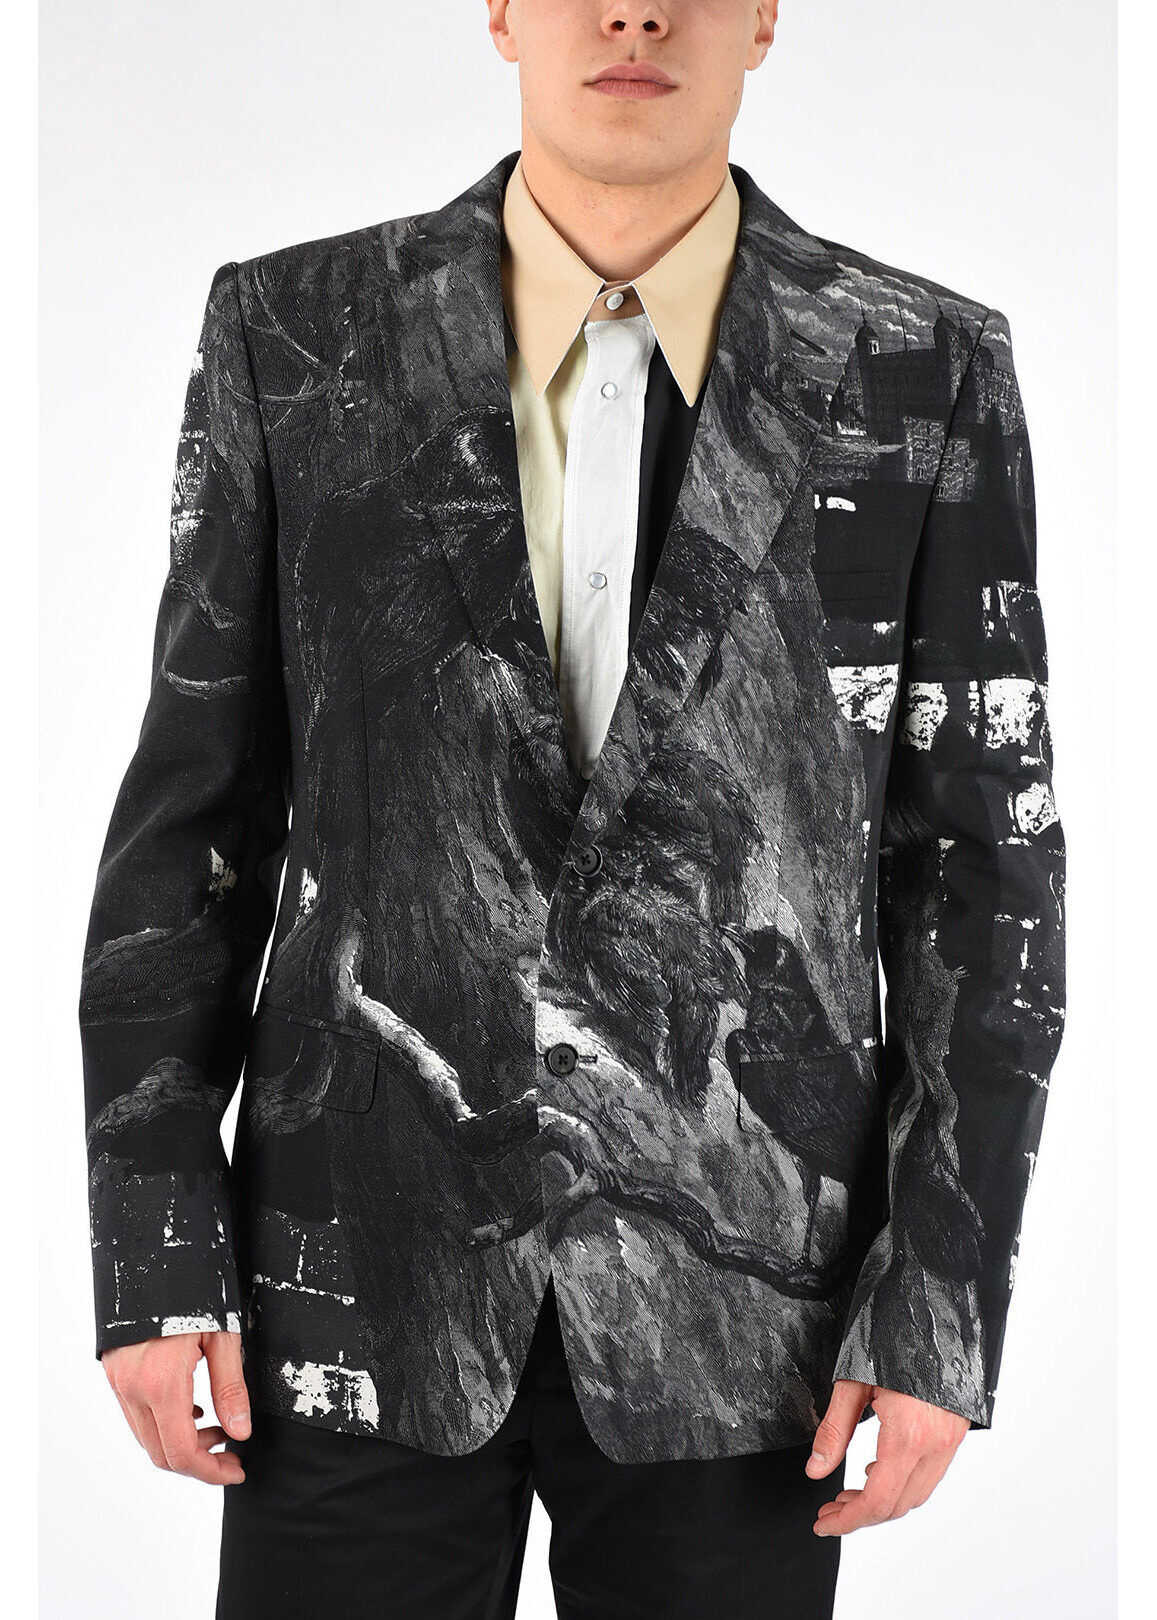 Alexander McQueen Virgin Wool Blend Blazer BLACK